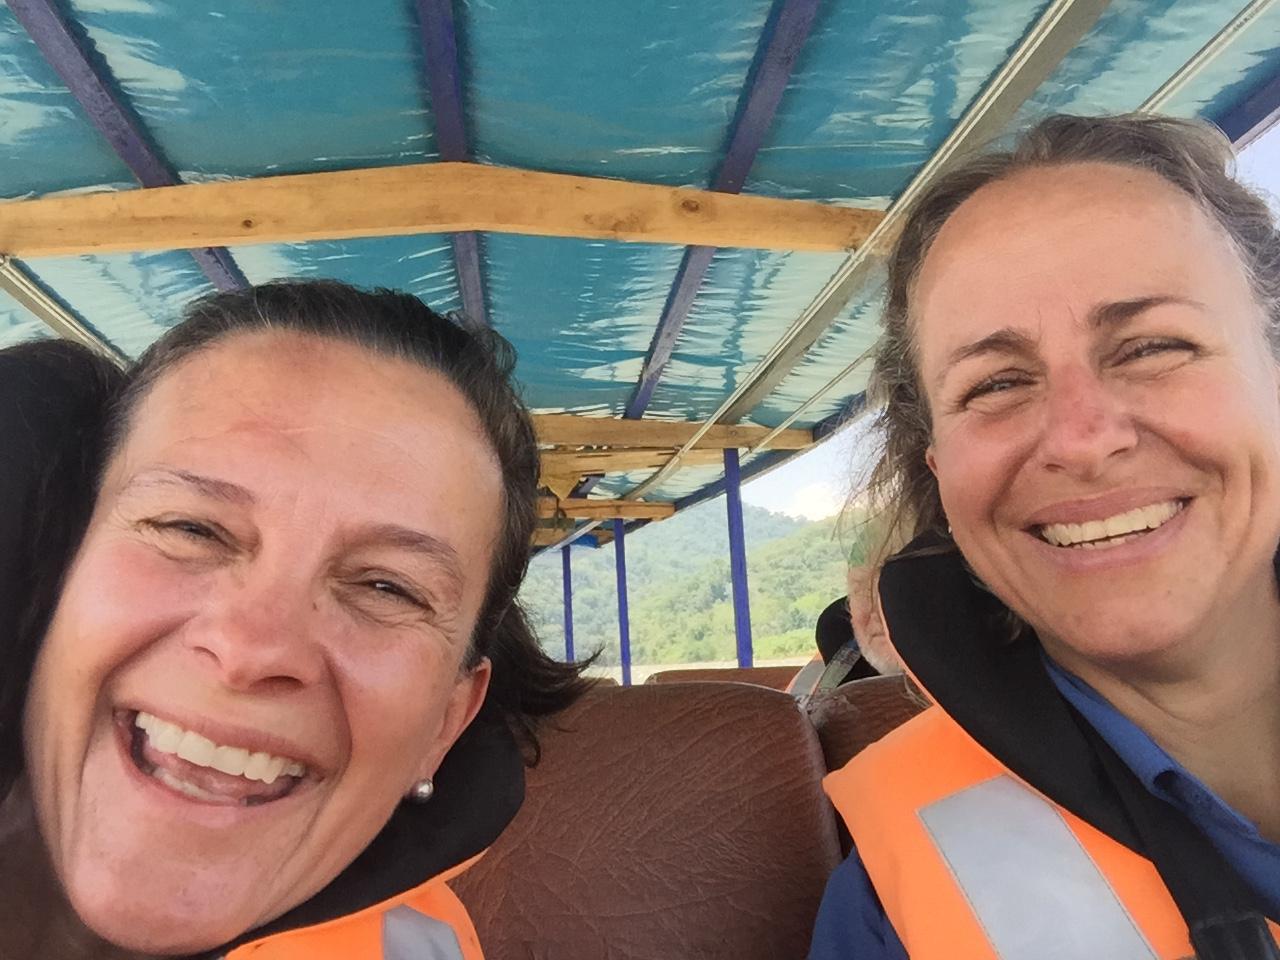 Manu Learning Centre Lodge: Marisol's Trip, Aracari Travel